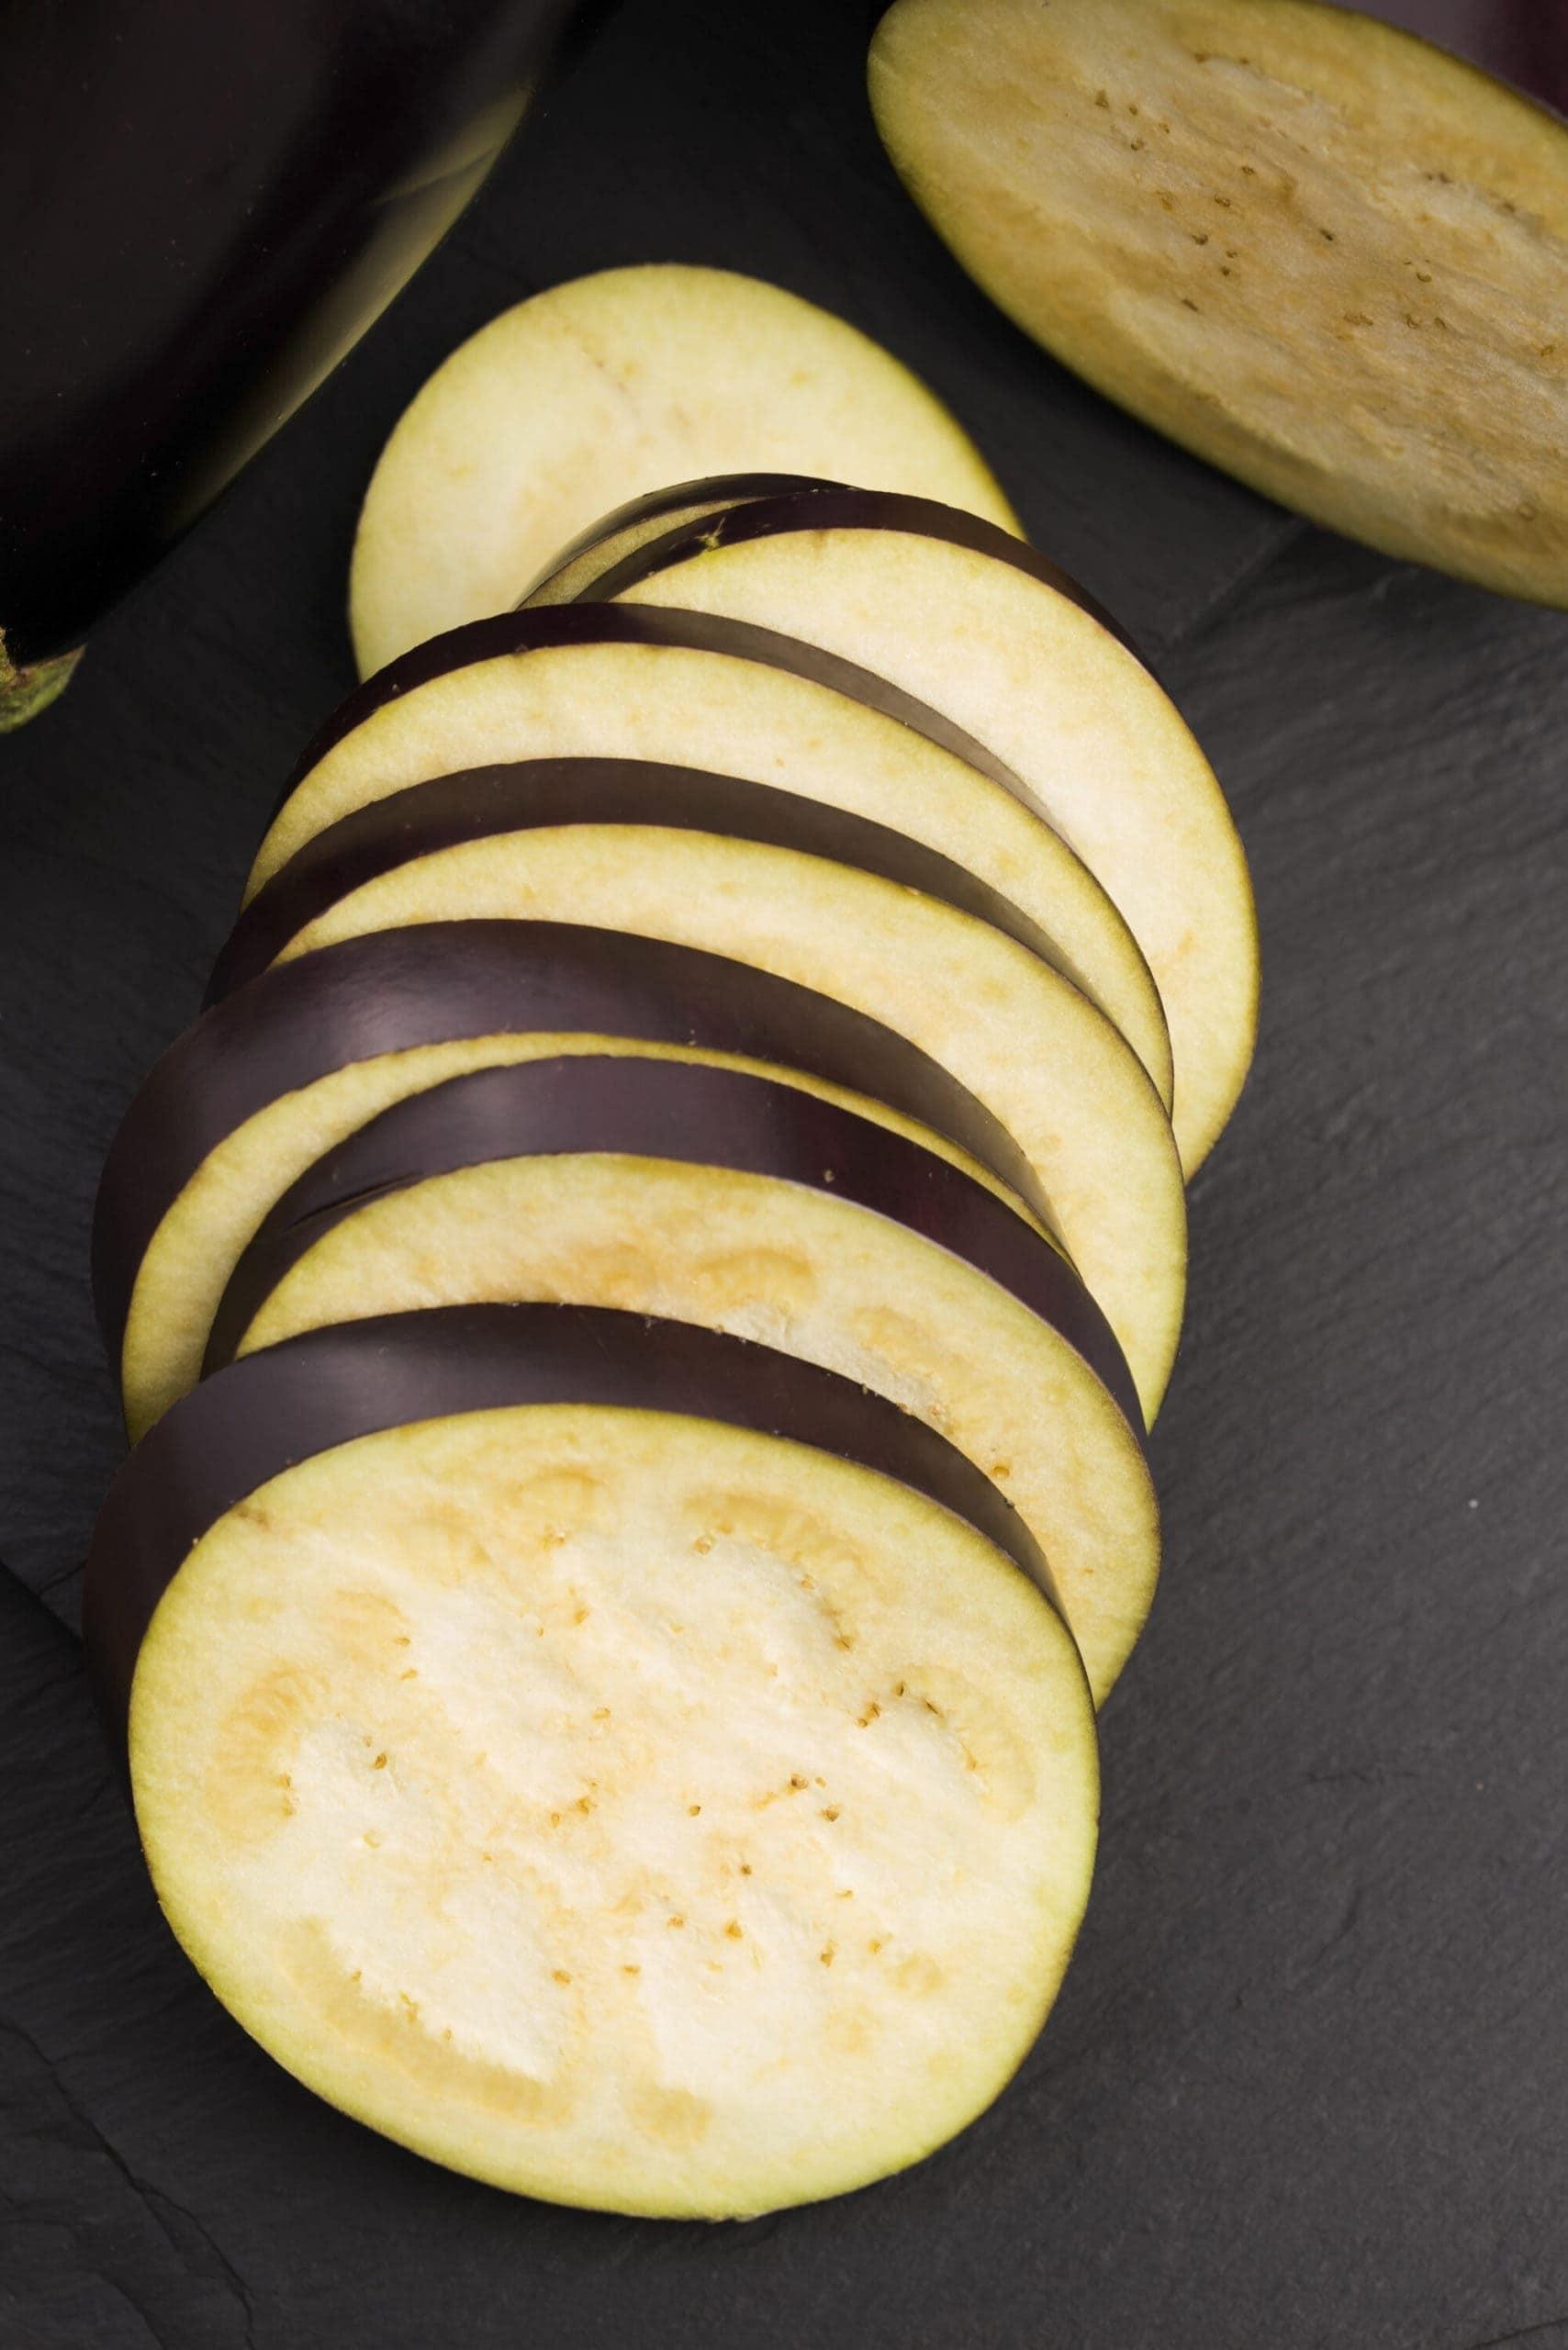 eggplant slices on a dark background